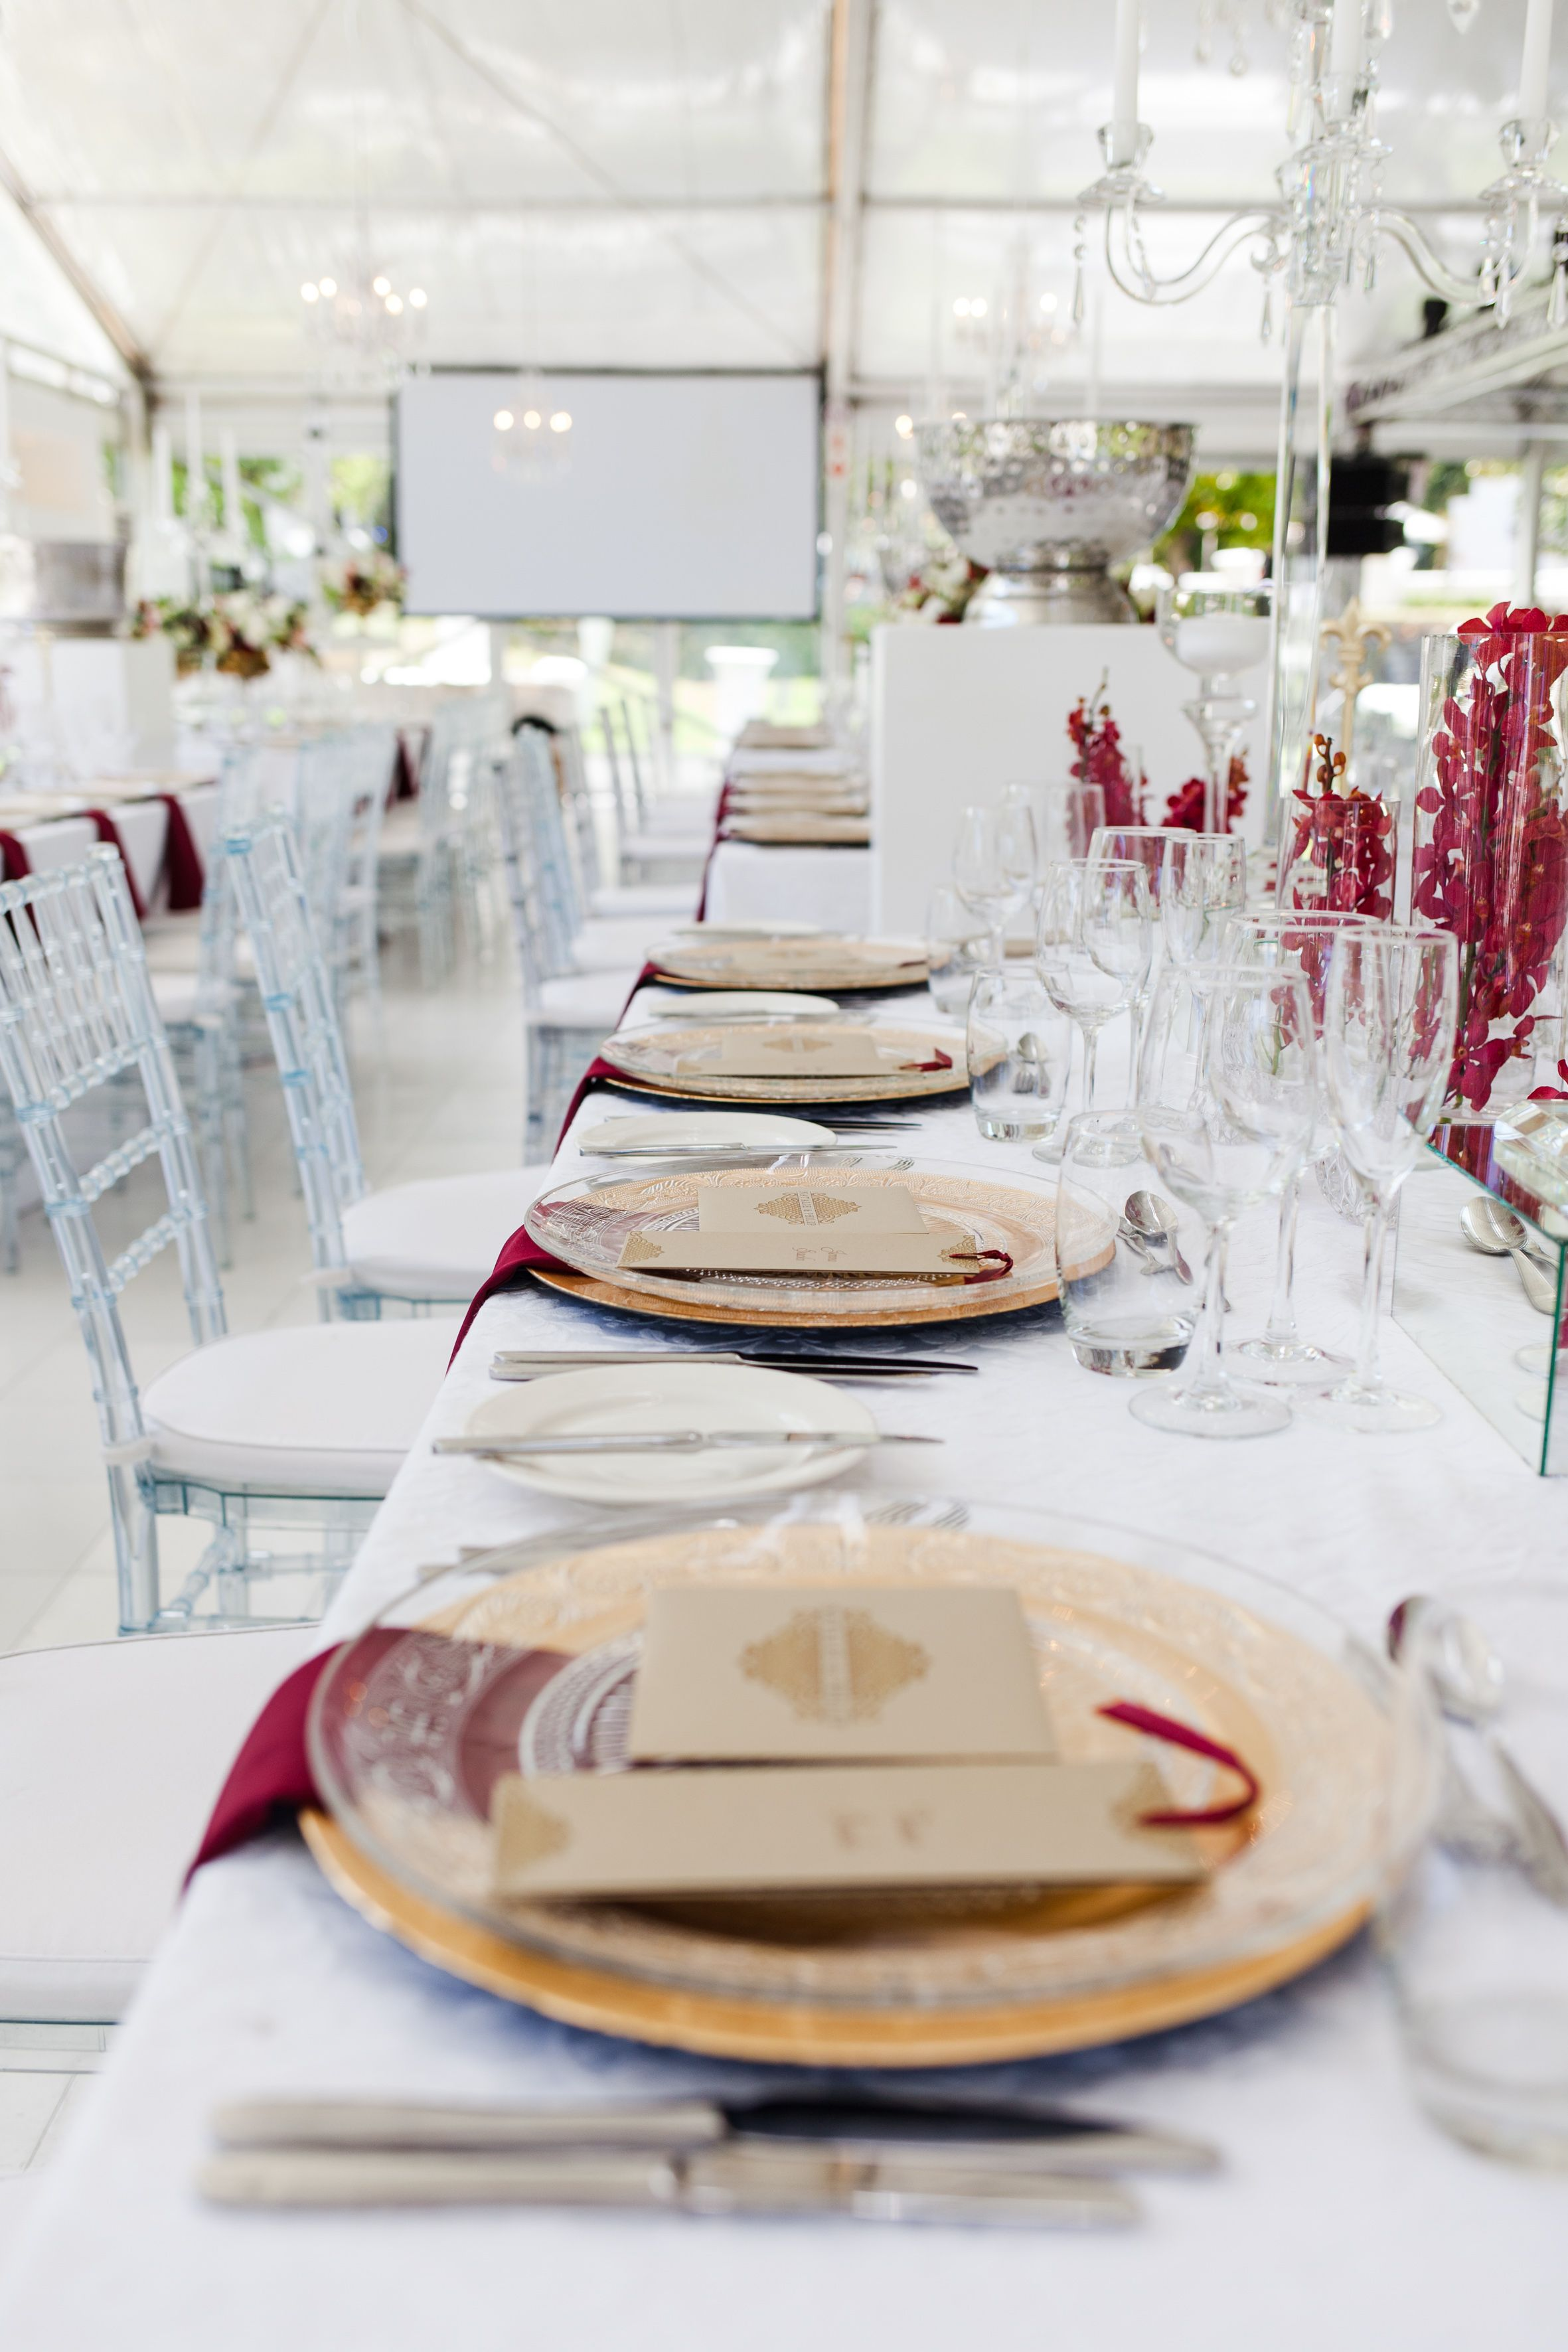 Elegant White, Gold and Burgundy Wedding   Table Setting   Sorrento Events